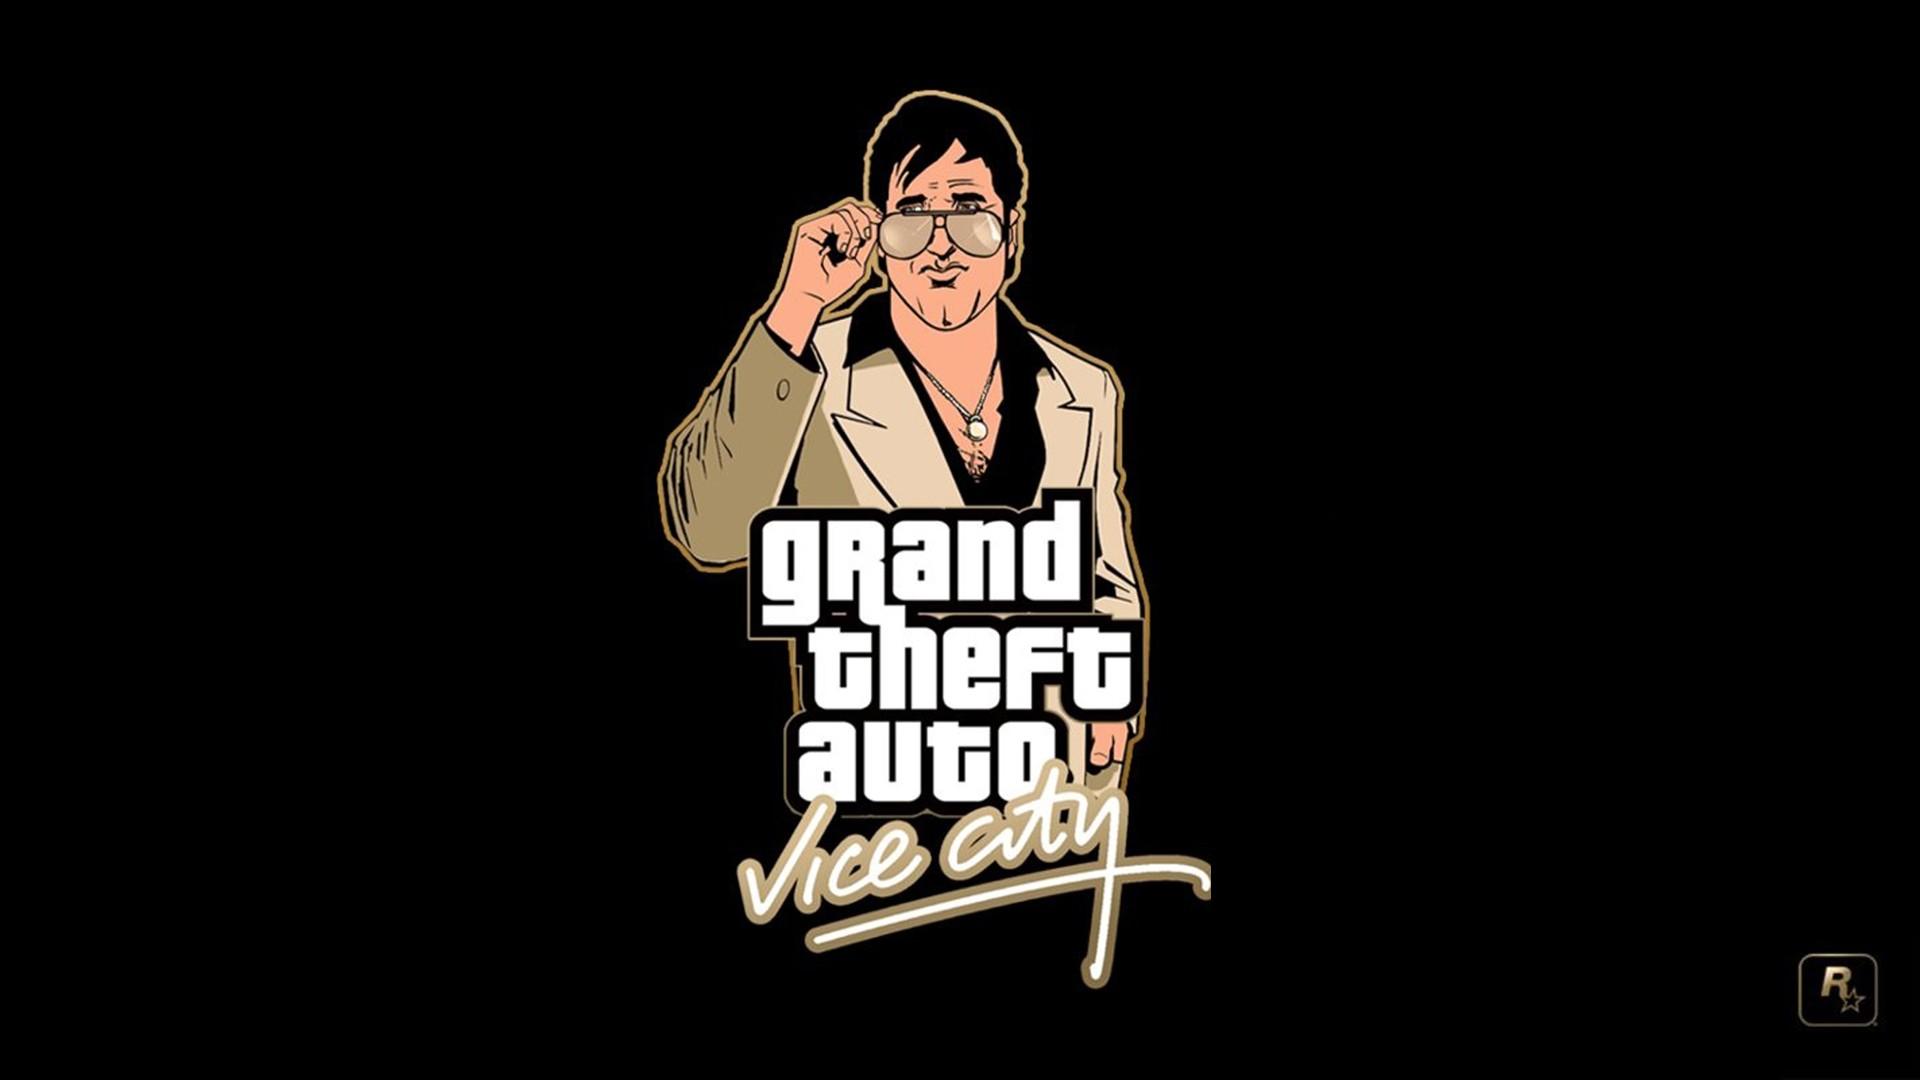 Fondos De Pantalla Ilustración Videojuegos Grand Theft